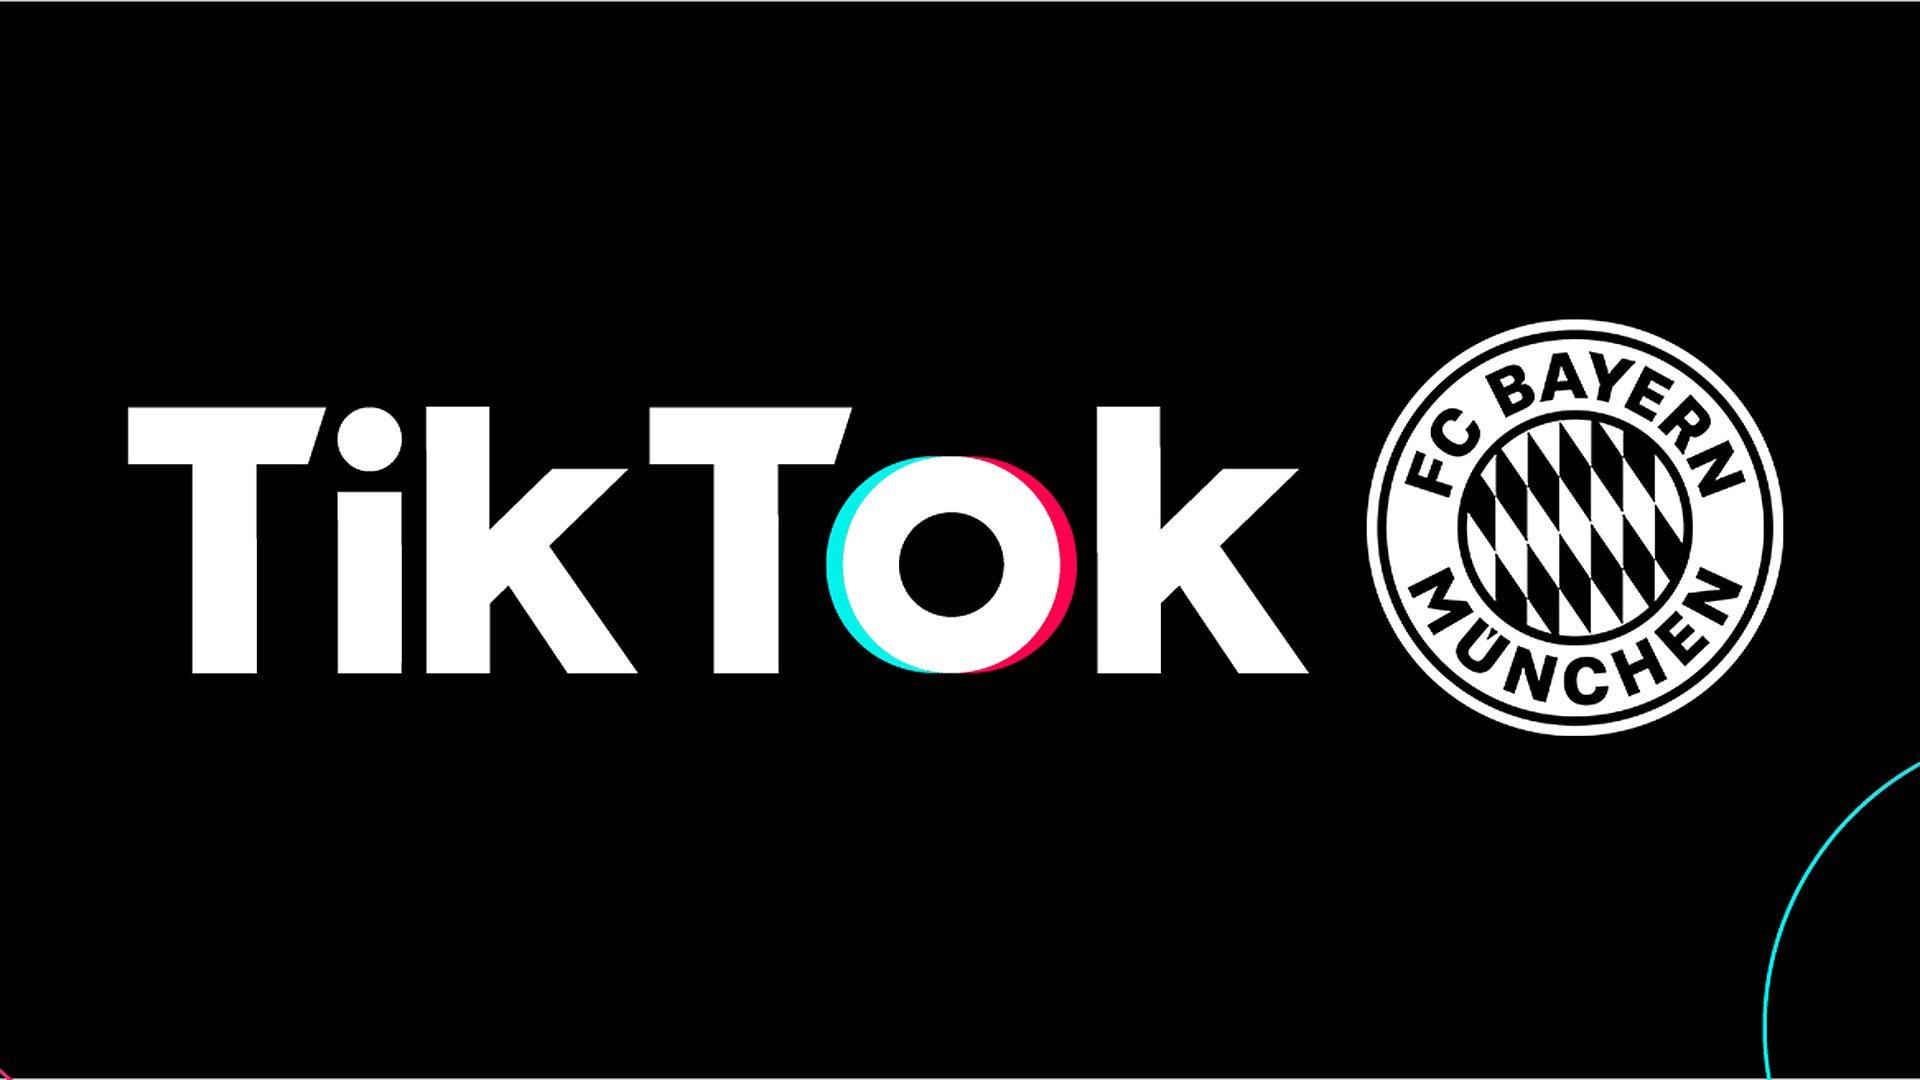 Tiktok FC Bayern